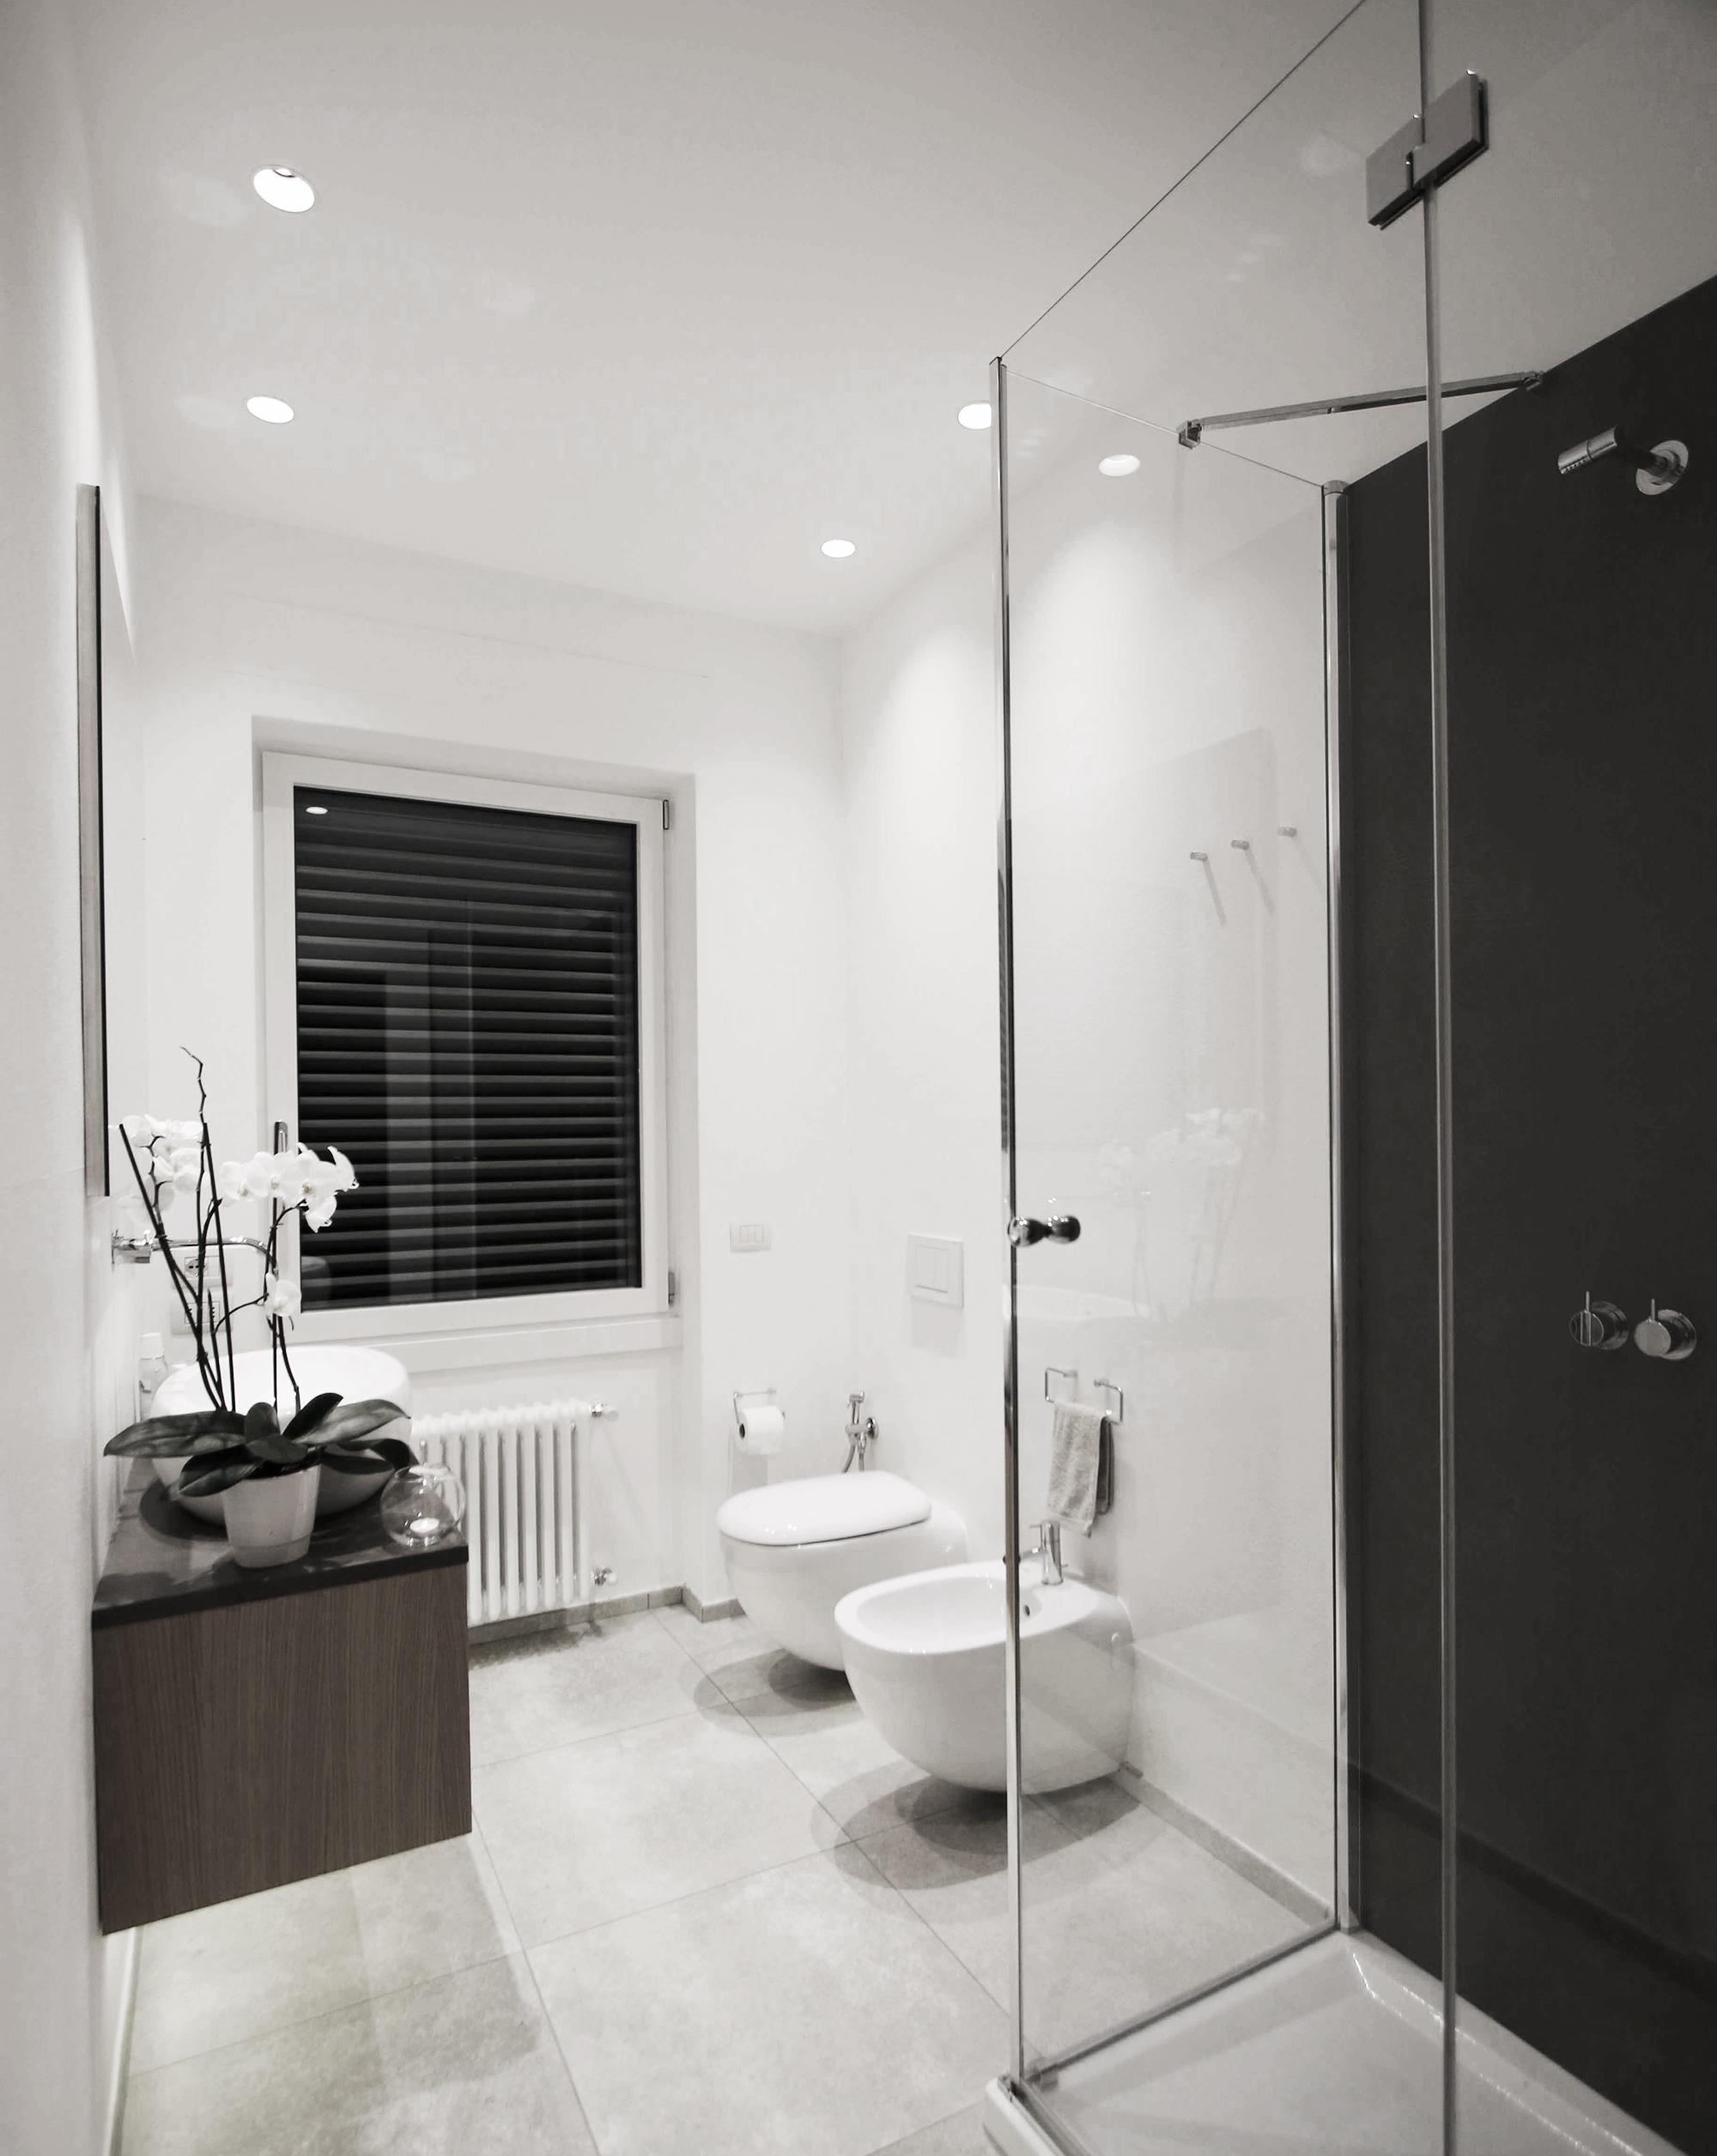 umberto_mauri_architetto_mauri_studio_lago_pusiano_como_bosisio_parini_private_renovation_house_residential_2000_07